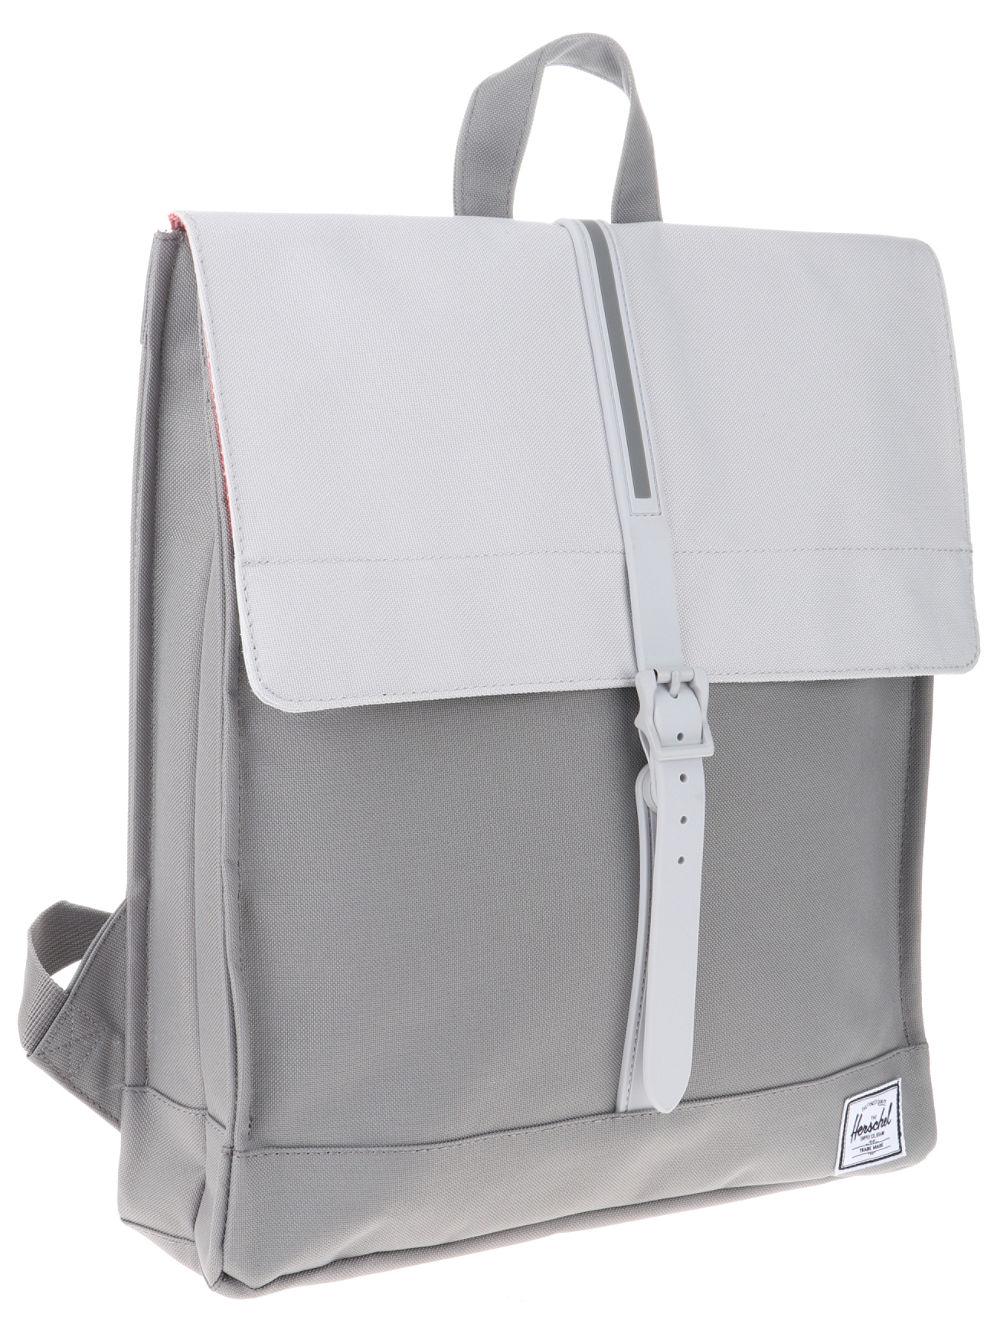 67265b586b Buy Herschel City Backpack online at blue-tomato.com